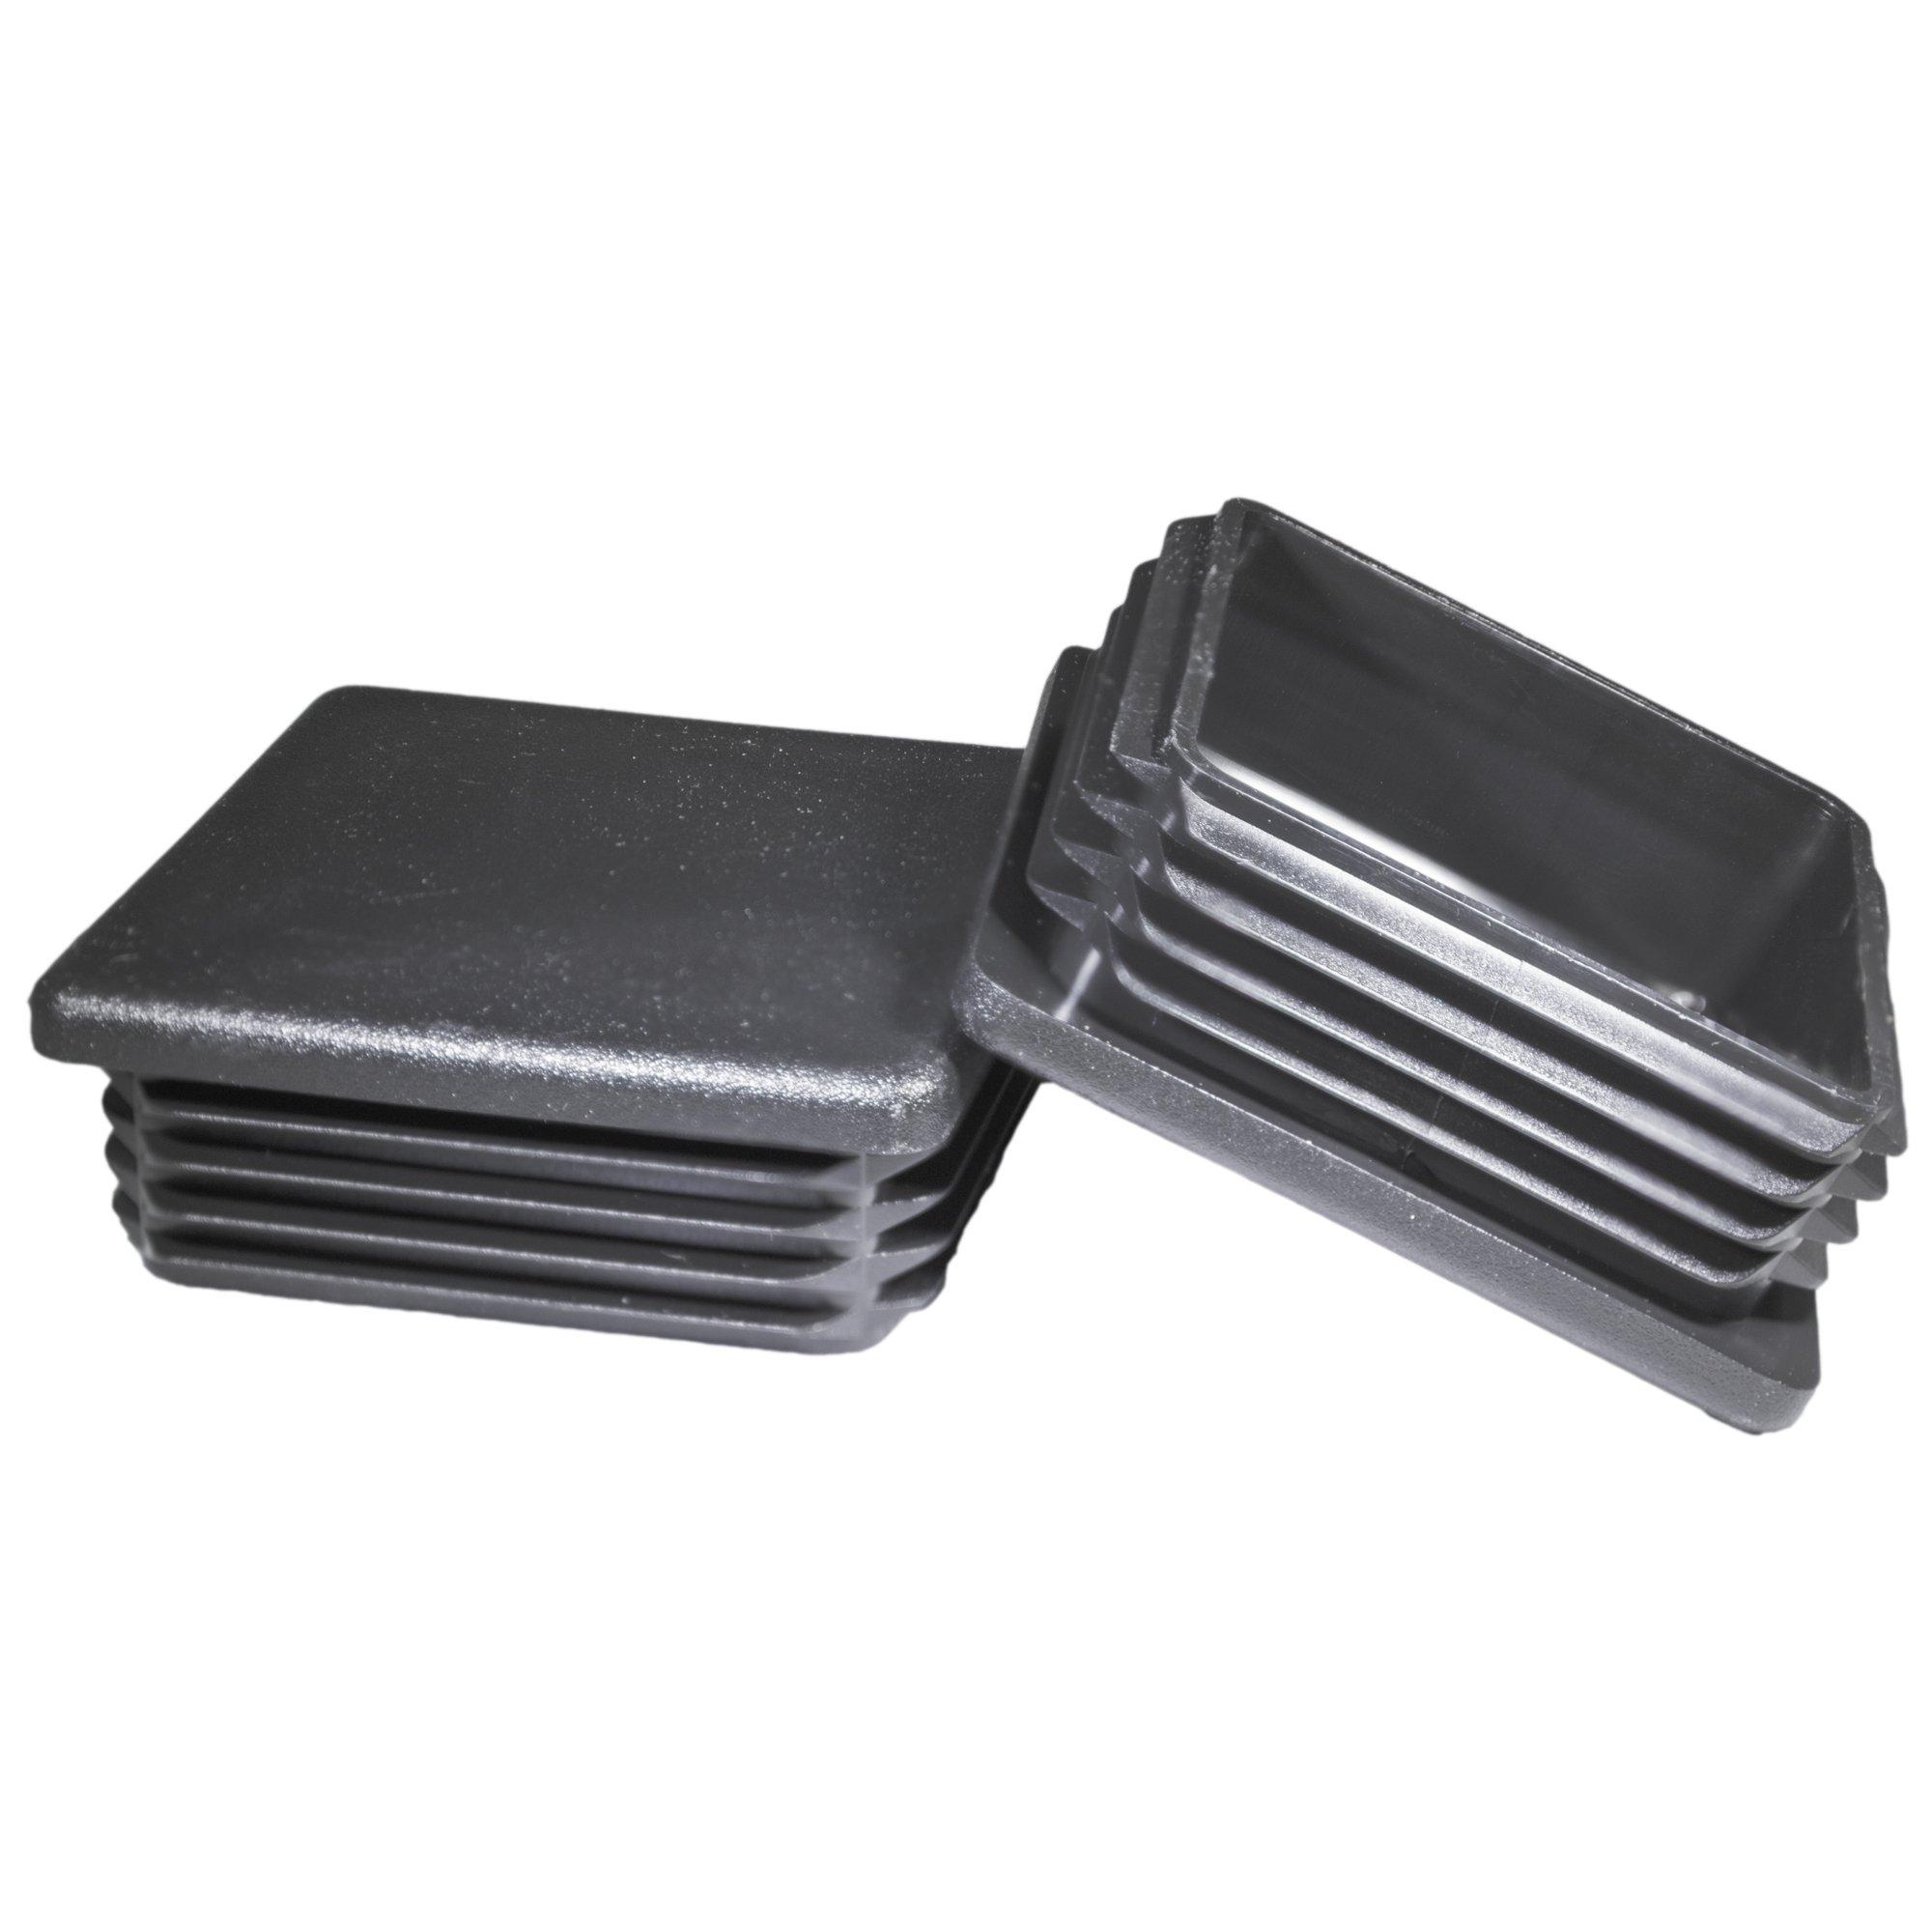 2 Pack: 3 Inch Square Plastic Plug, Heavy Duty Tubing Post End Cap